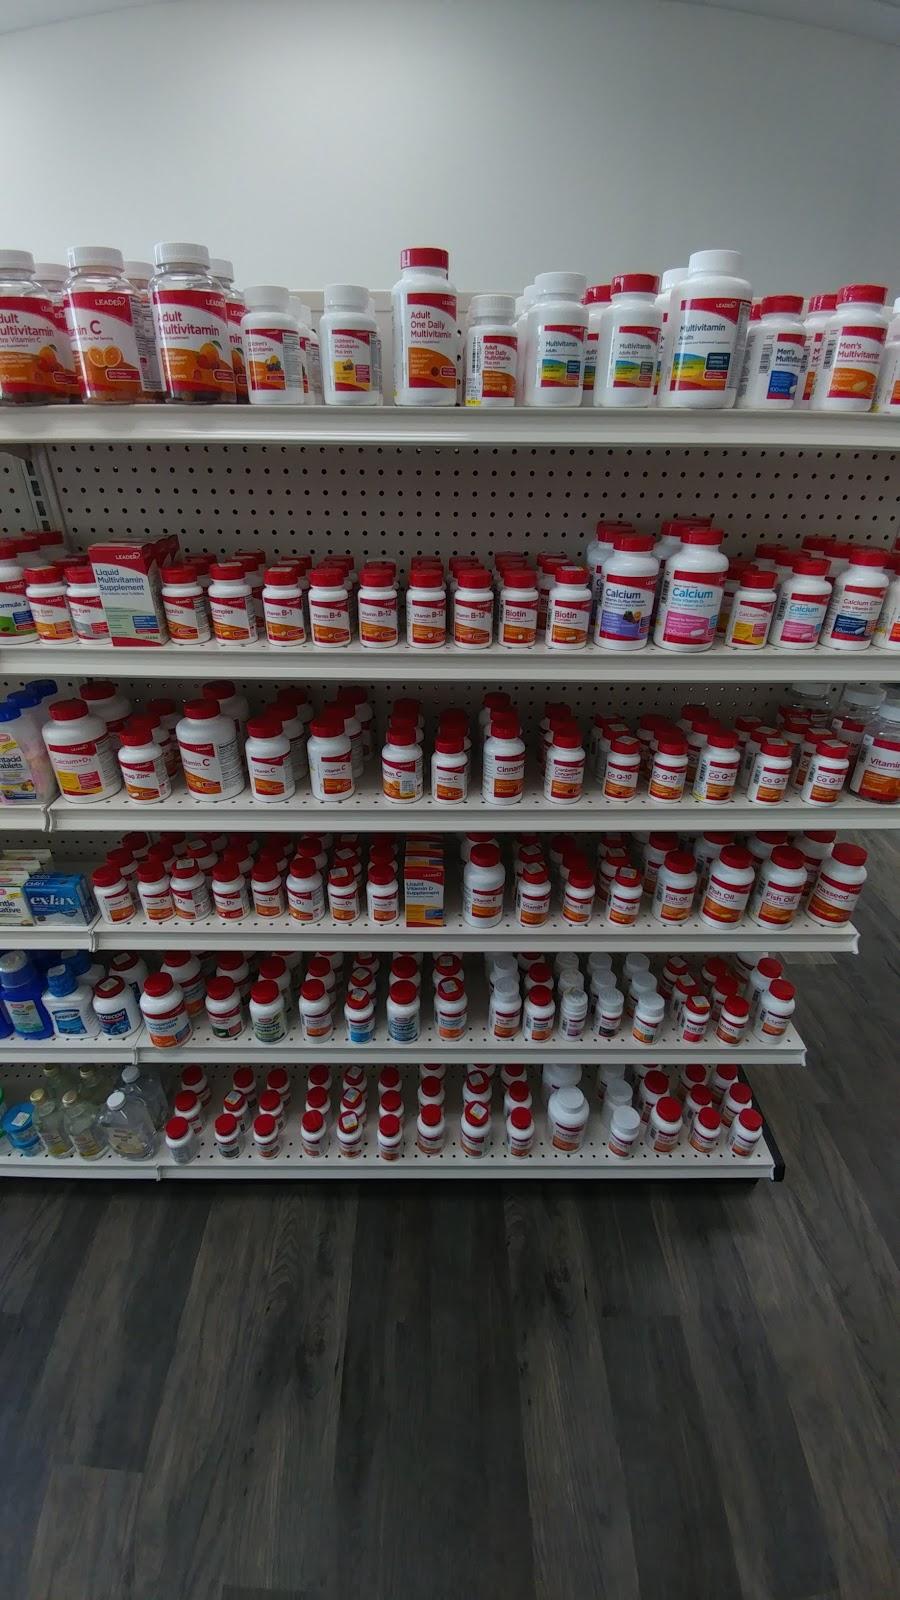 Frisco Pharmacy - pharmacy  | Photo 2 of 10 | Address: 14550 TX-121 STE 150, Frisco, TX 75035, USA | Phone: (469) 305-7058